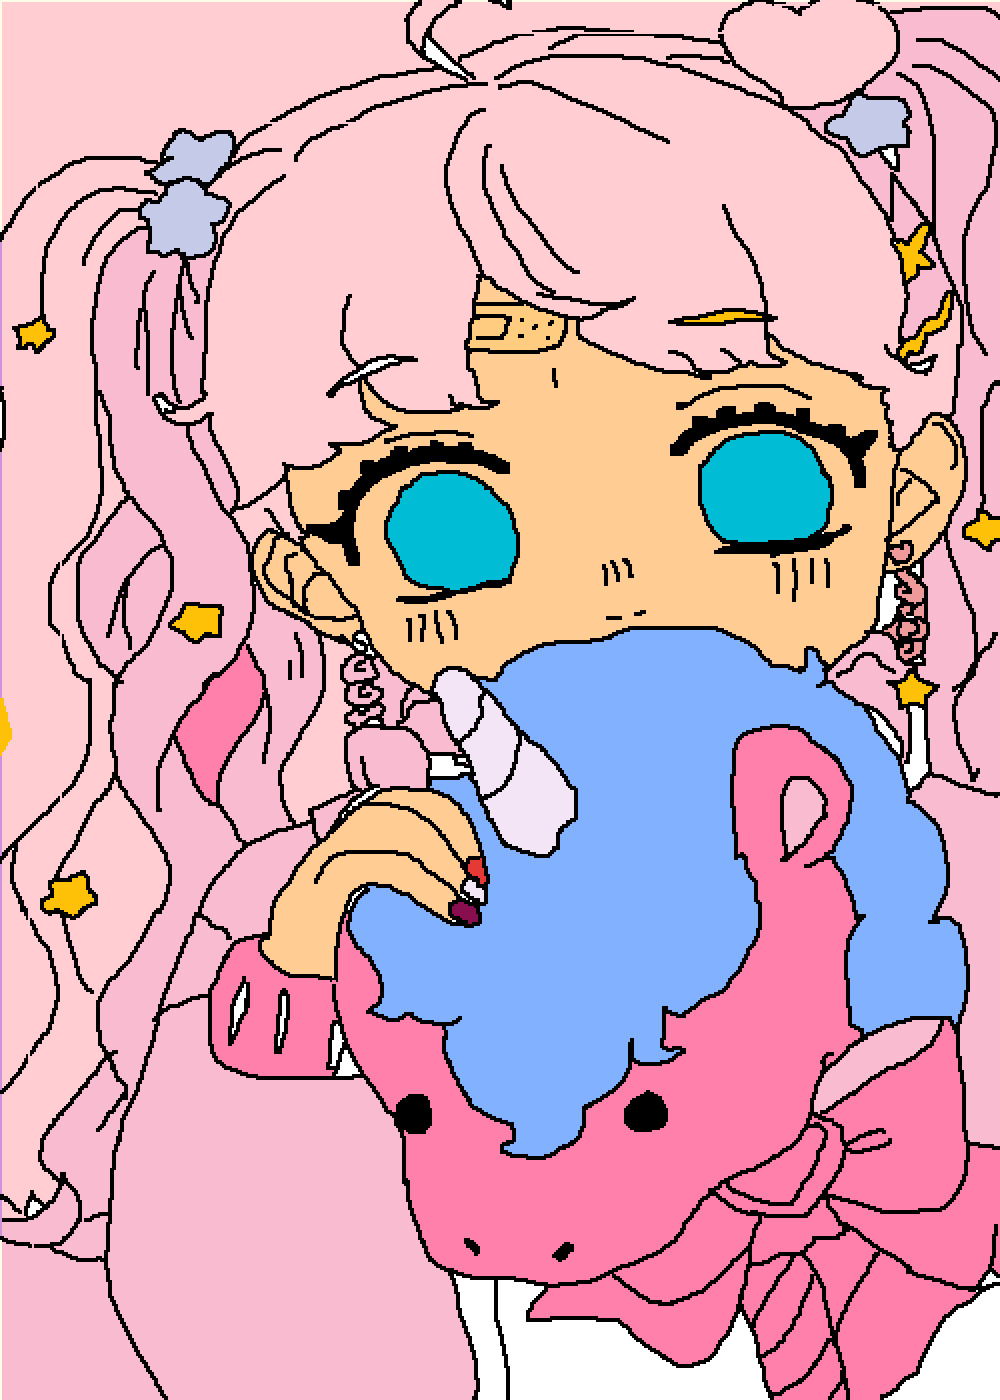 Cute girl by Dem0nxAngexl